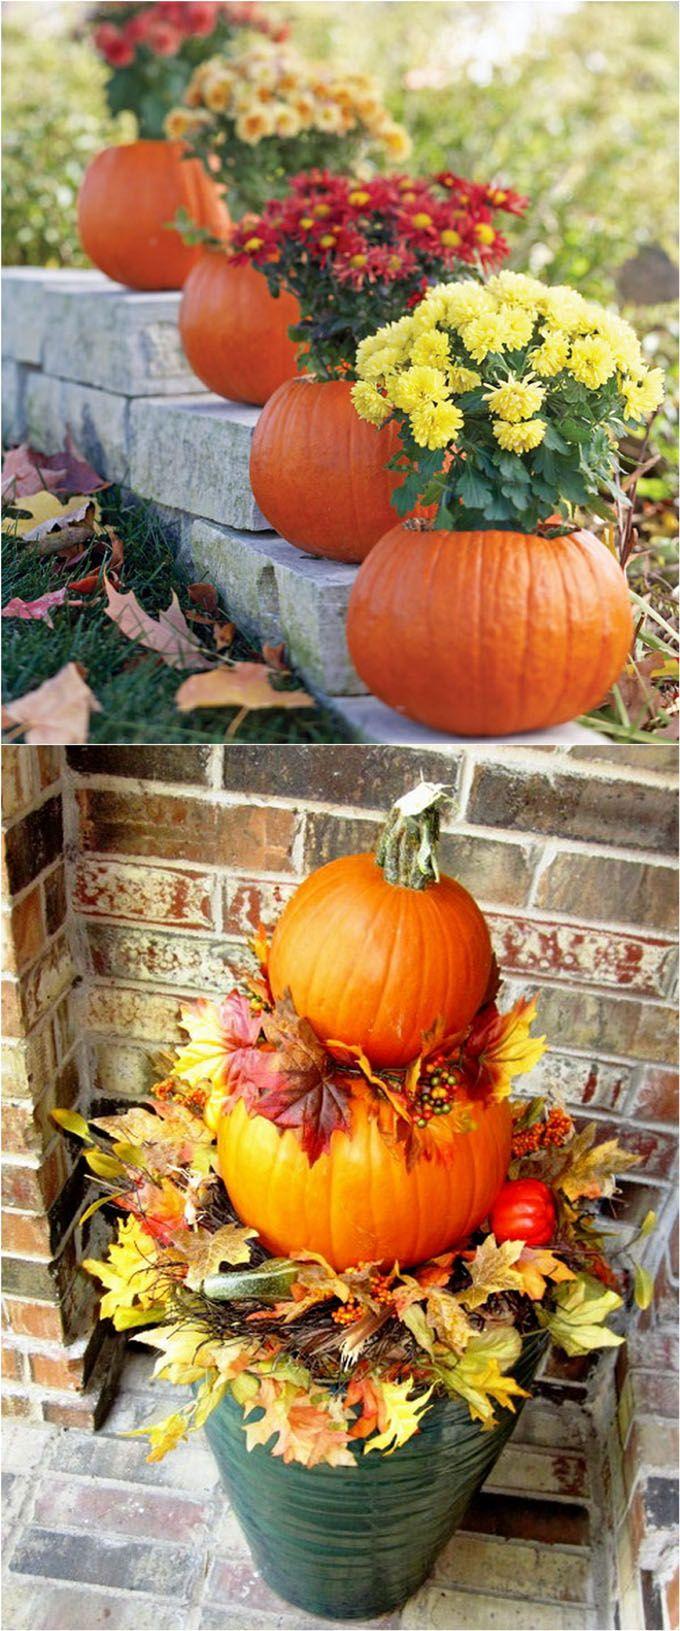 Best 25+ Outdoor fall decorations ideas on Pinterest ...